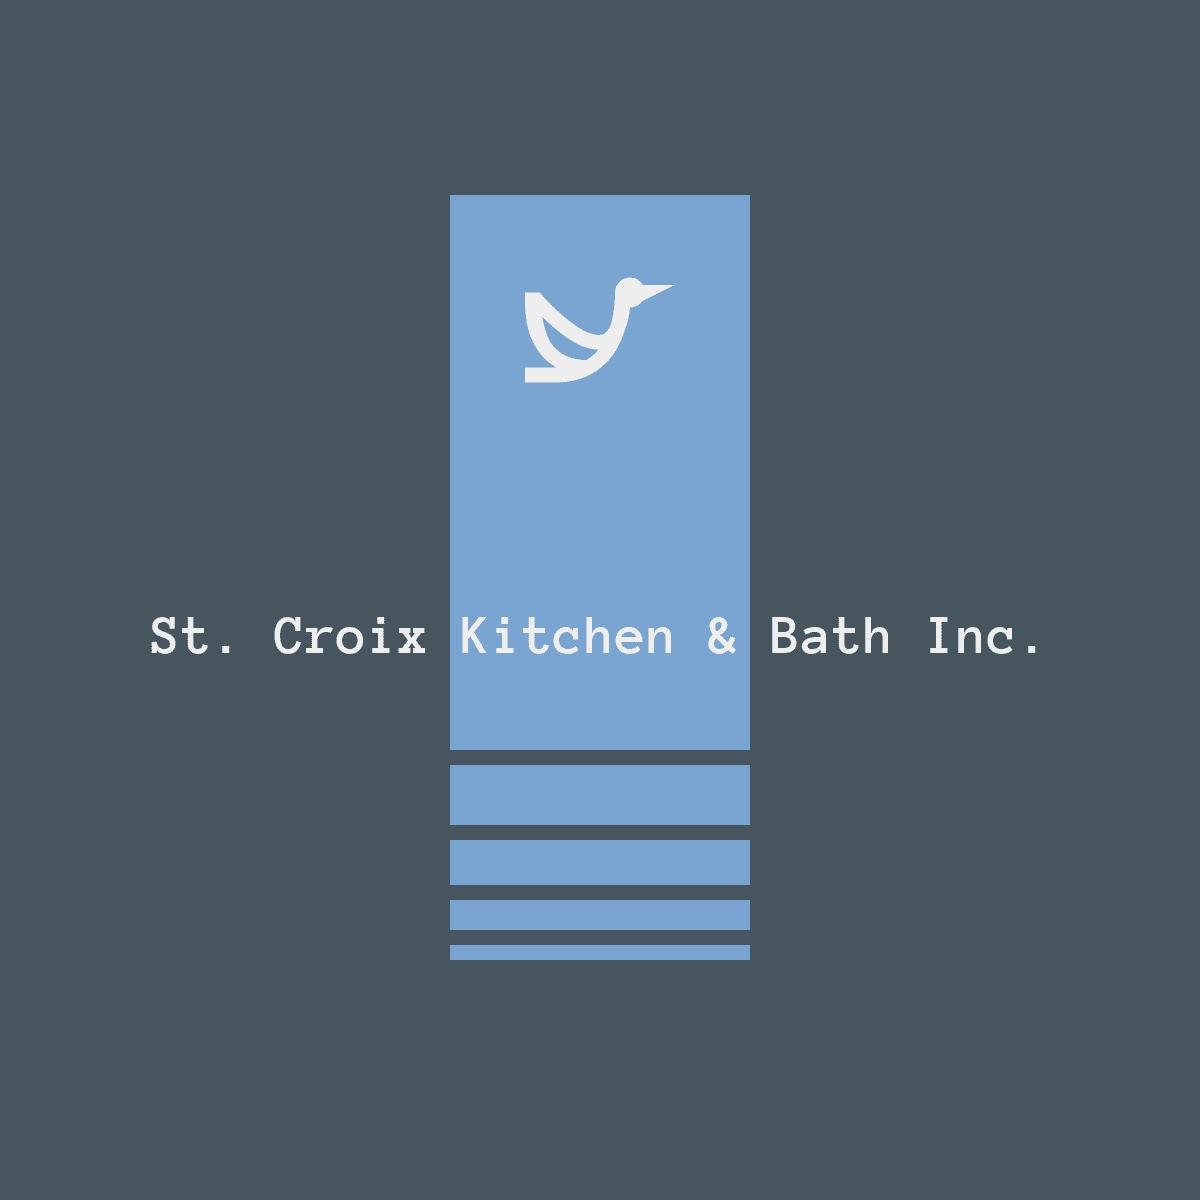 St. Croix Kitchen & Bath Inc. logo